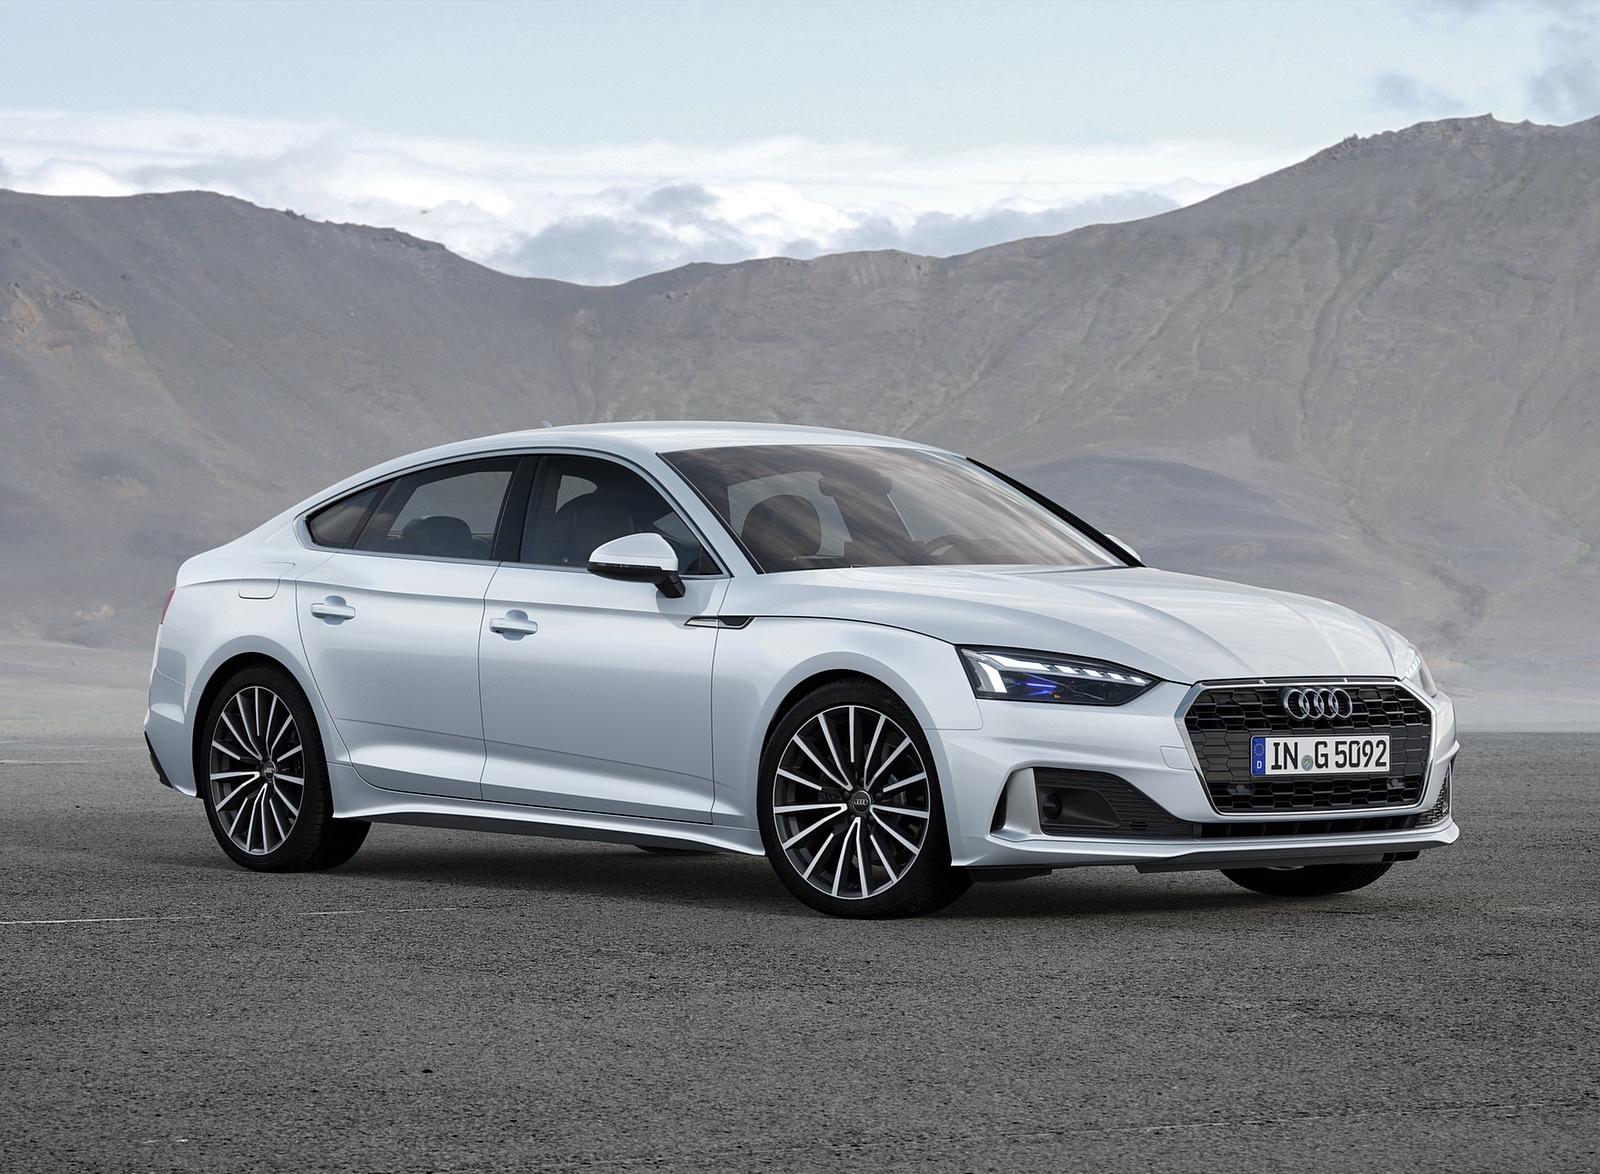 2020 Audi A5 Sportback g-tron (Color: Glacier White) Front Three-Quarter Wallpapers (3)